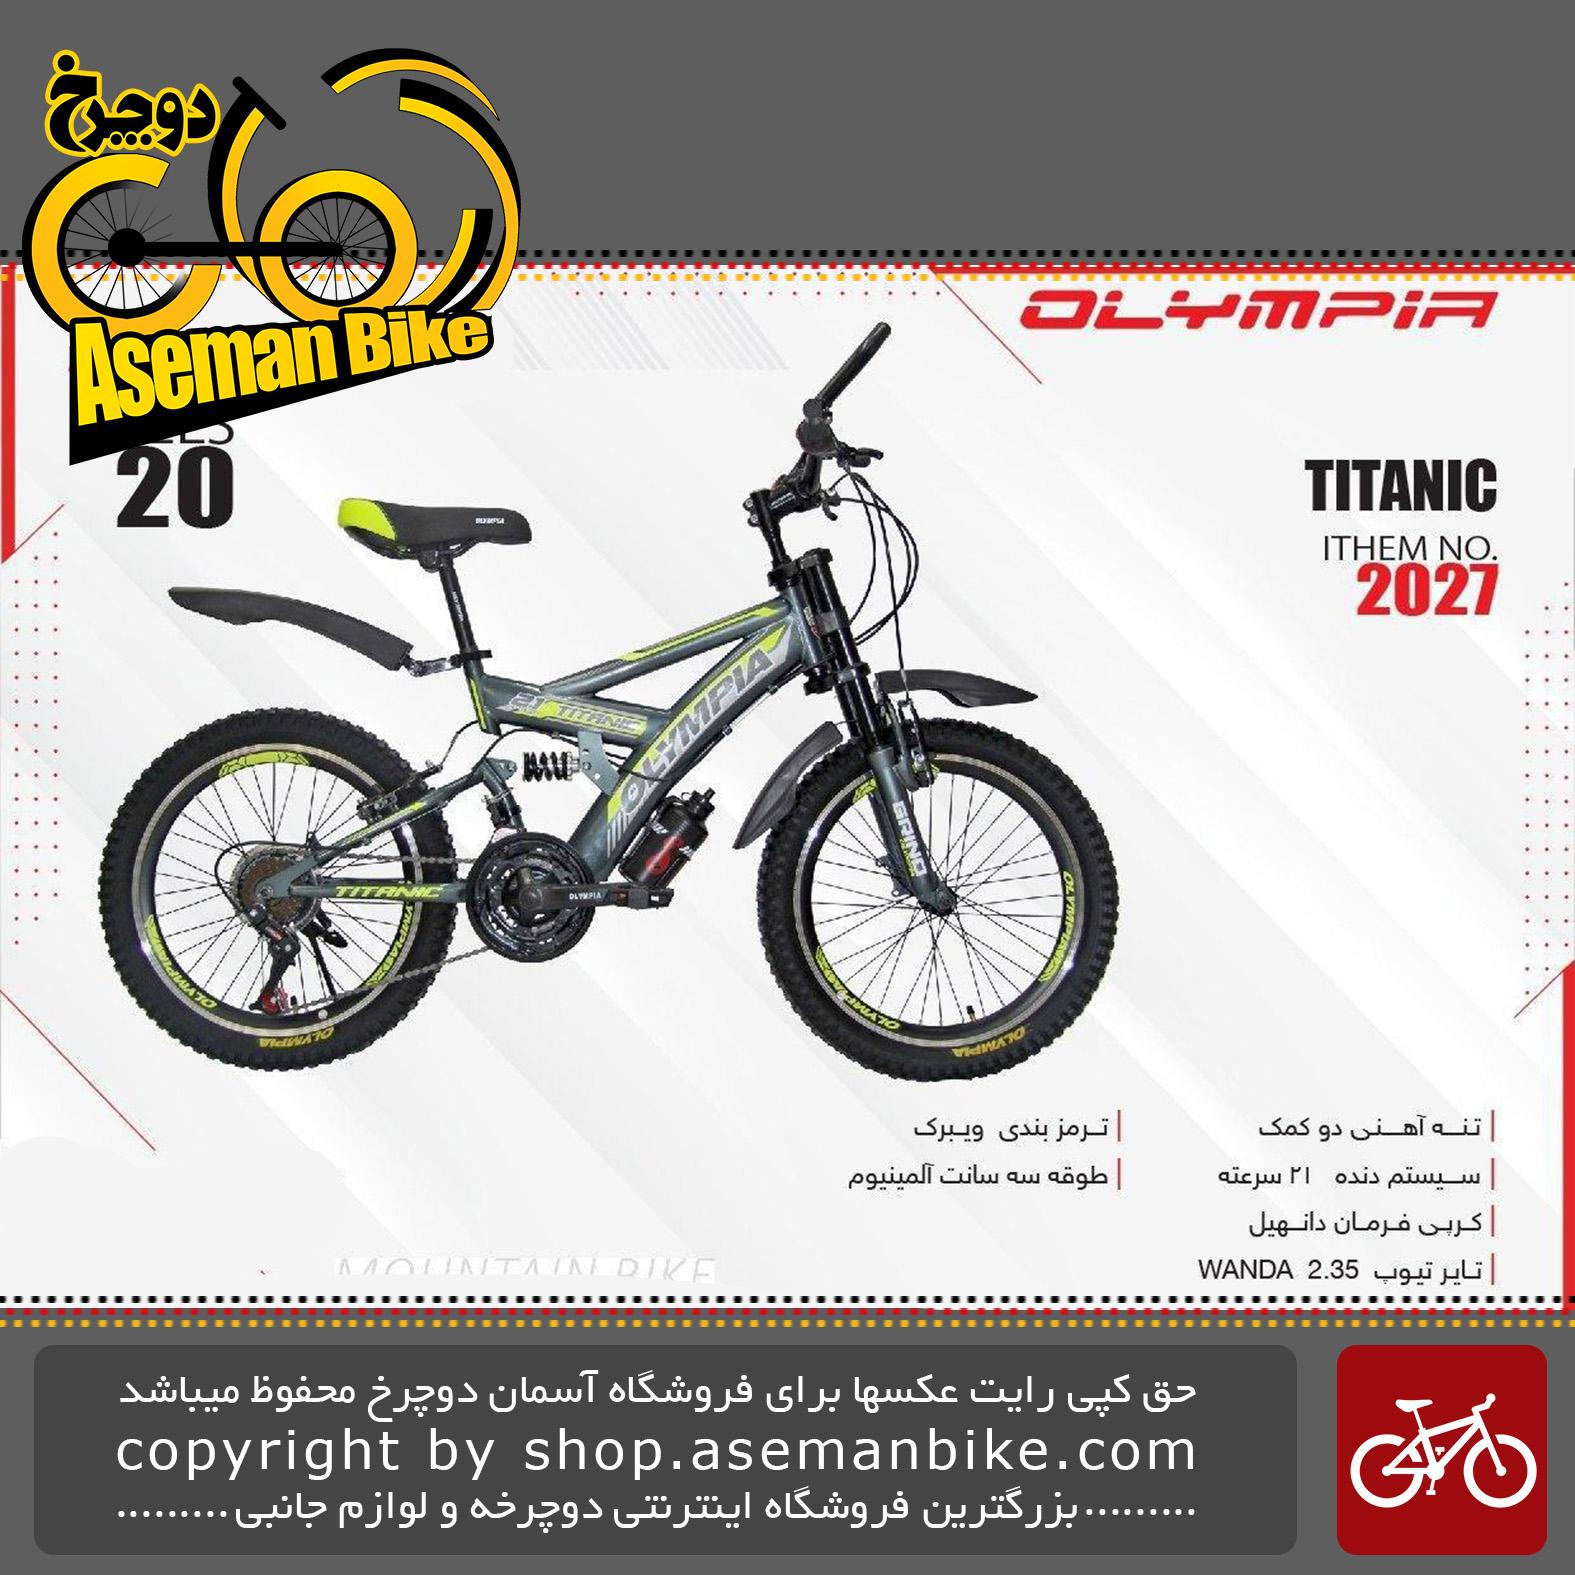 دوچرخه بچگانه دو کمک دنده المپیا سایز 20 مدل تایتانیک OLYMPIA Bicycle Children Size 20 Model TITANIC